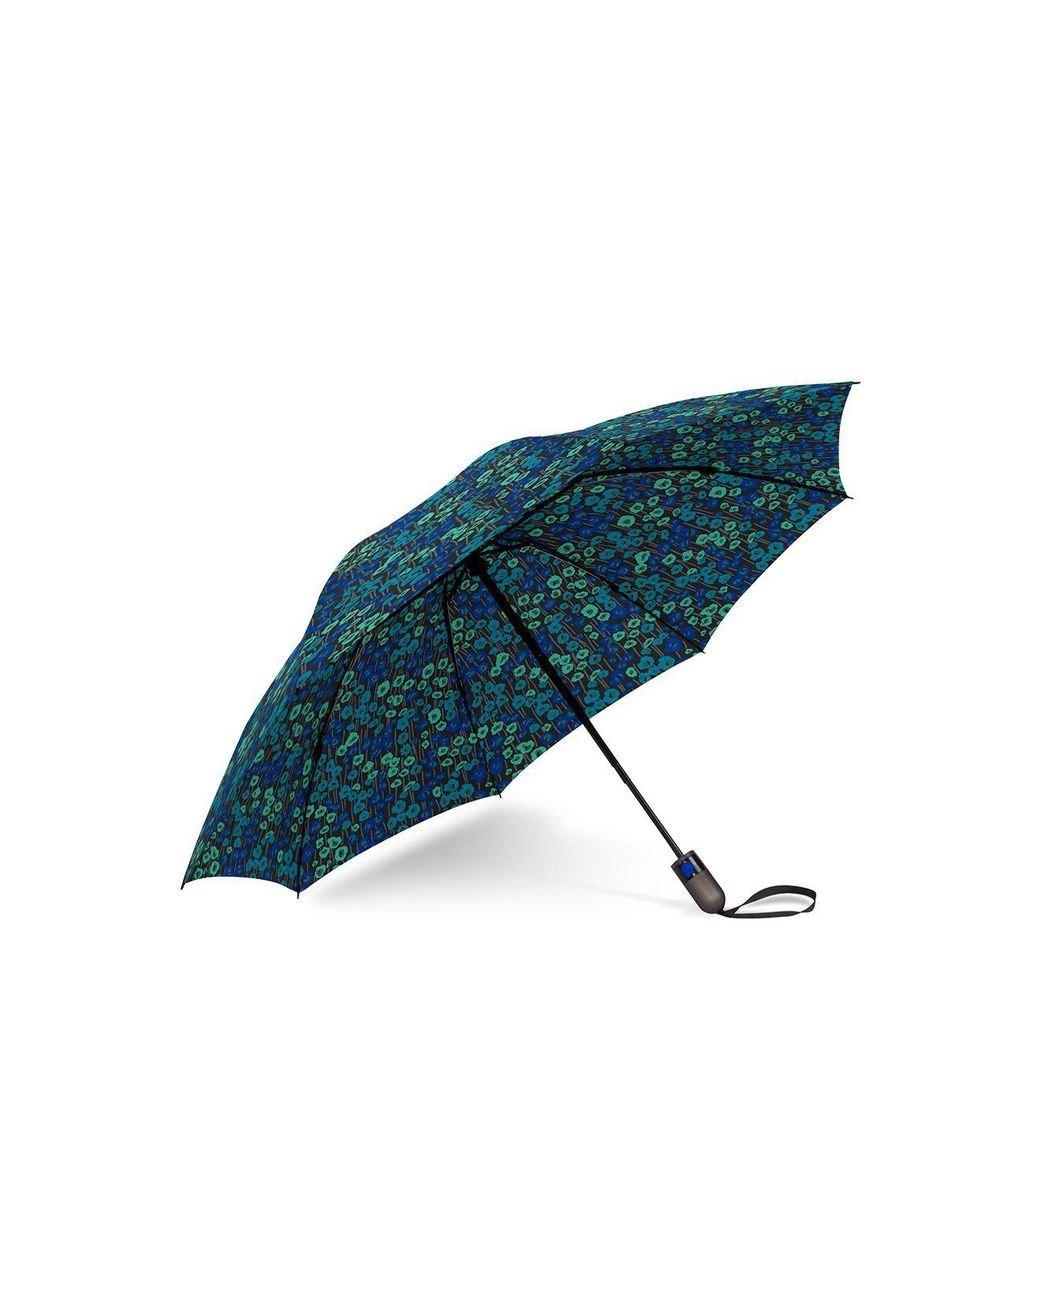 Monet ShedRain UnbelievaBrella Fashion Floral Print Reverse Umbrella